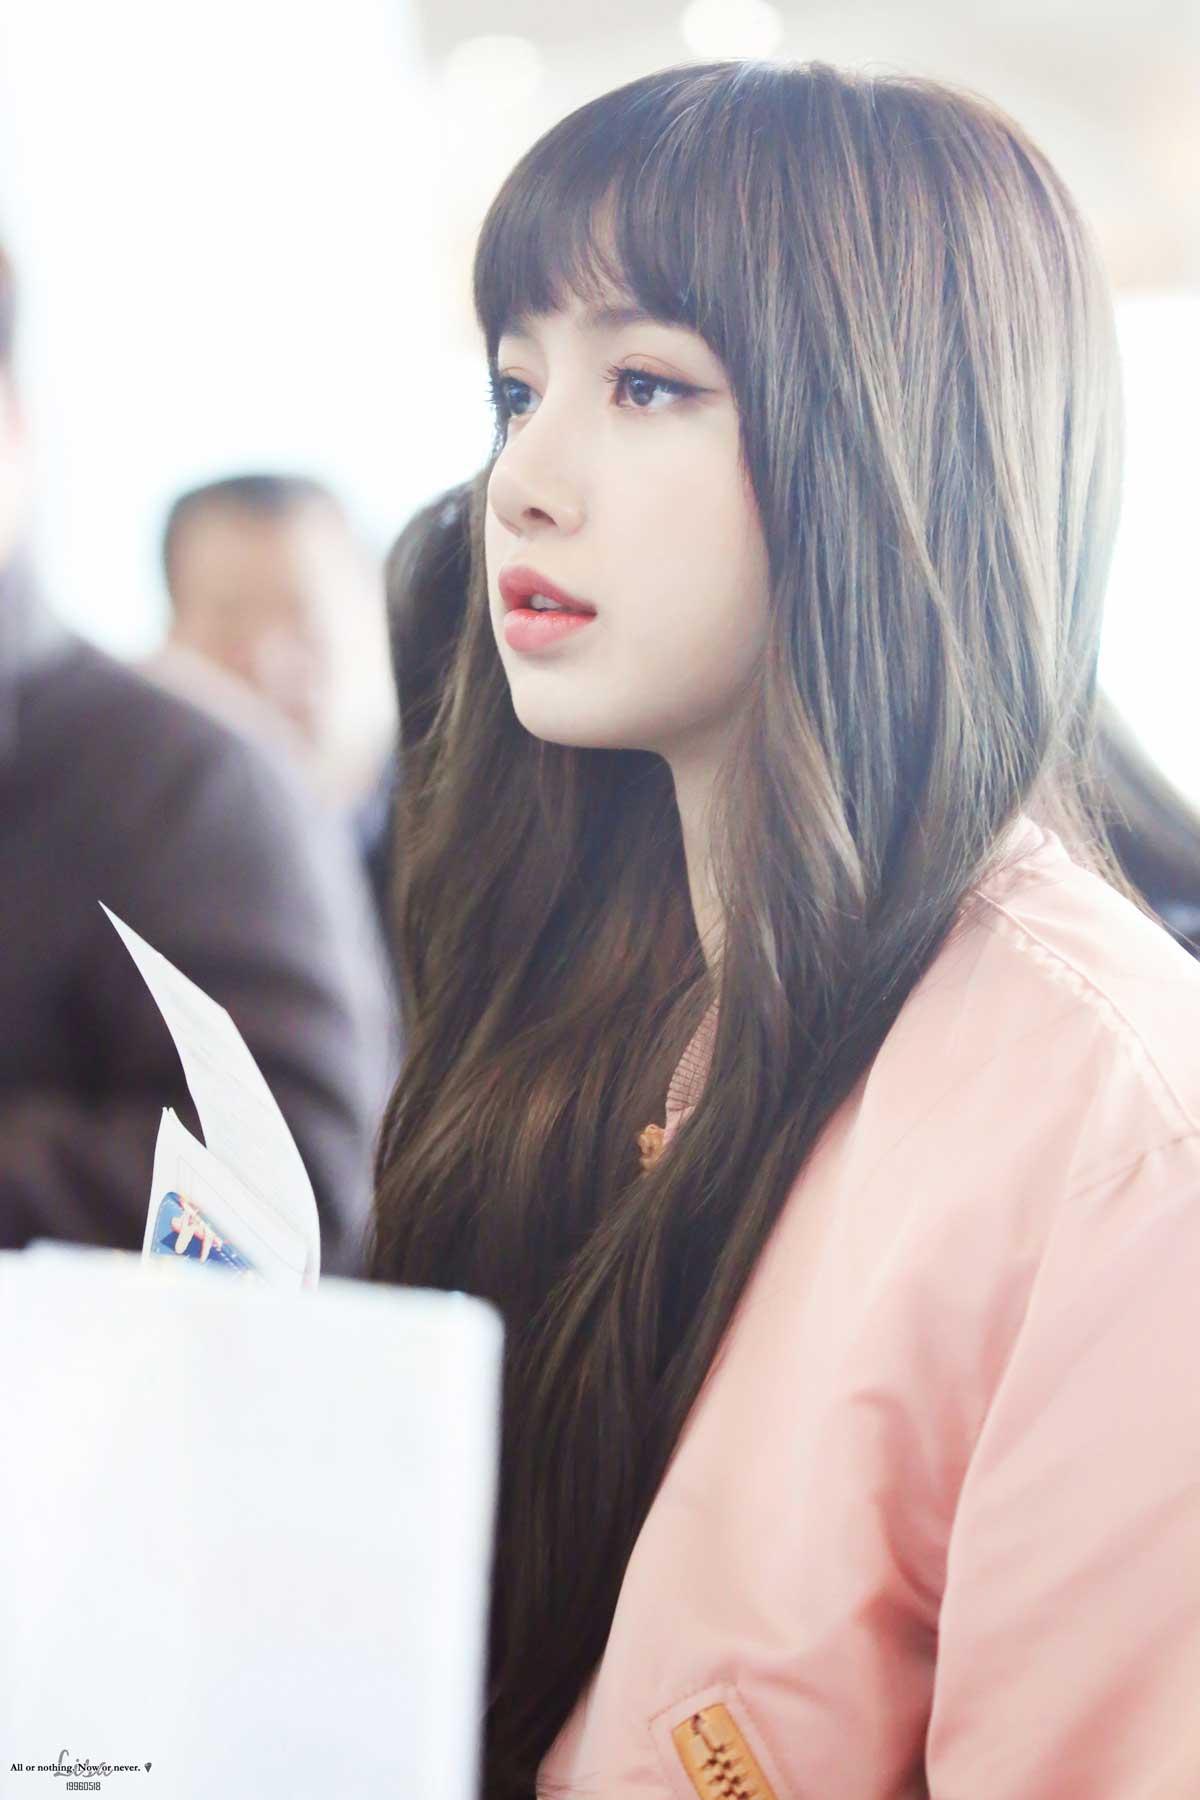 Blackpink Lisa Airport Fashion 25 March 2018 Jeju Island 3